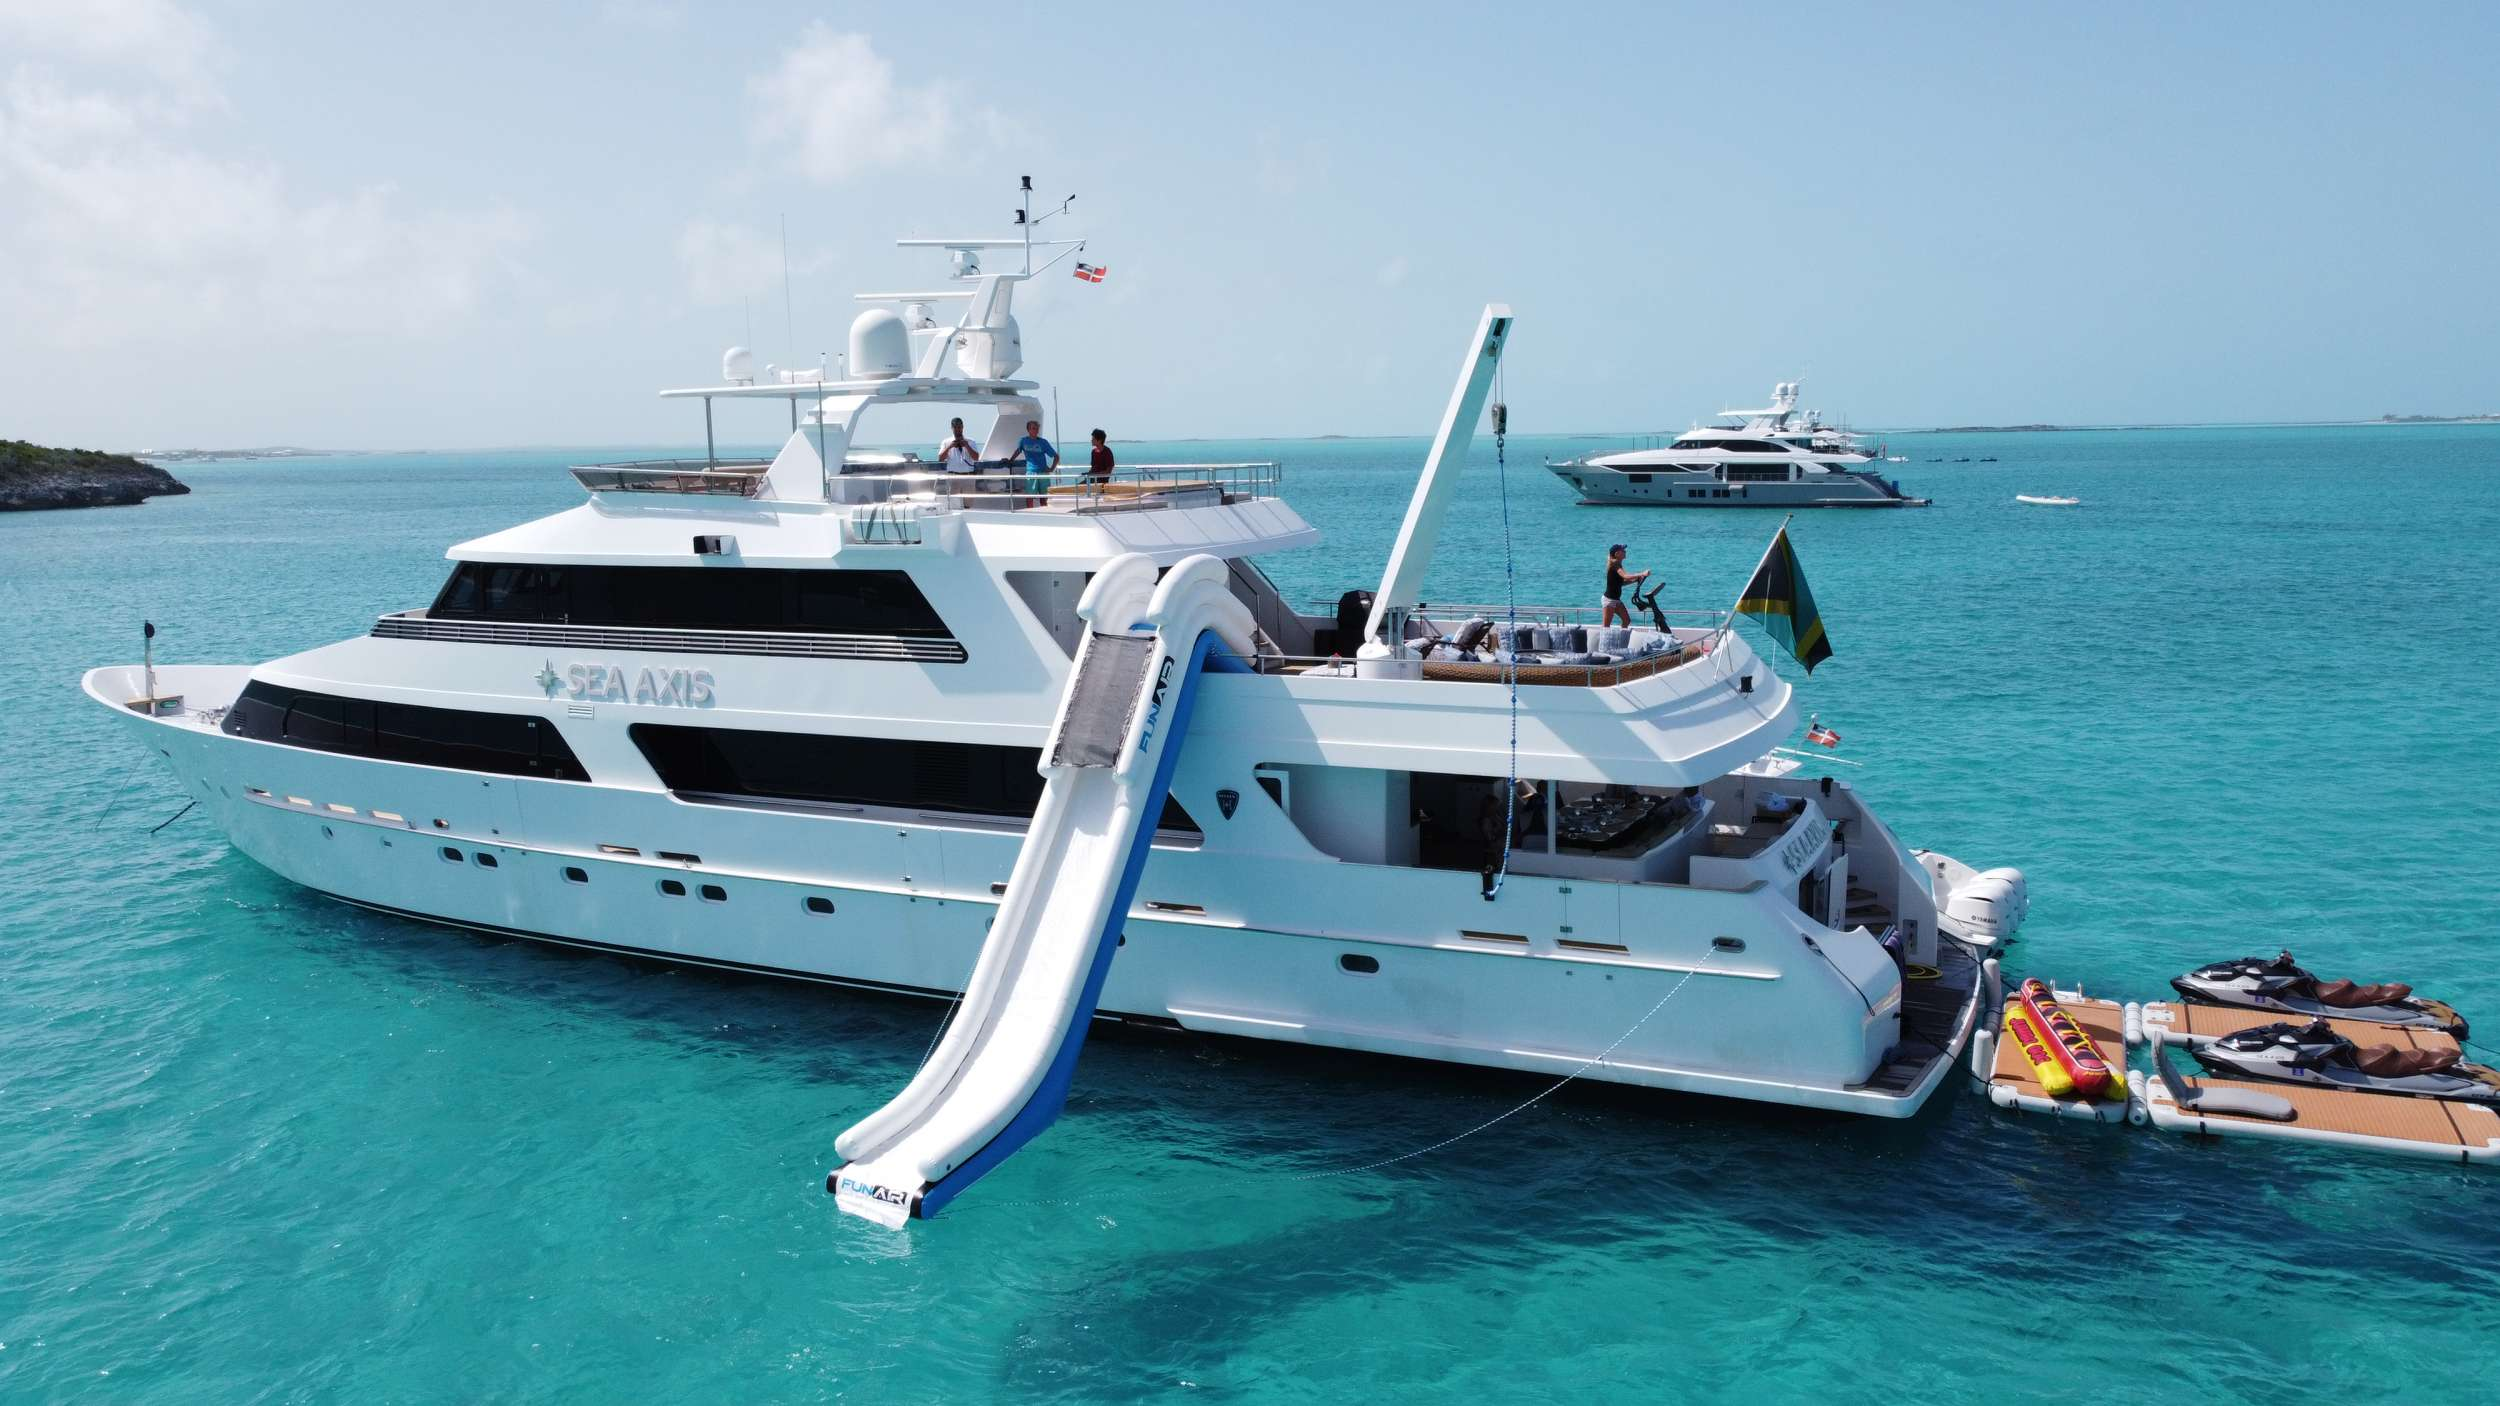 SEA AXIS yacht main image